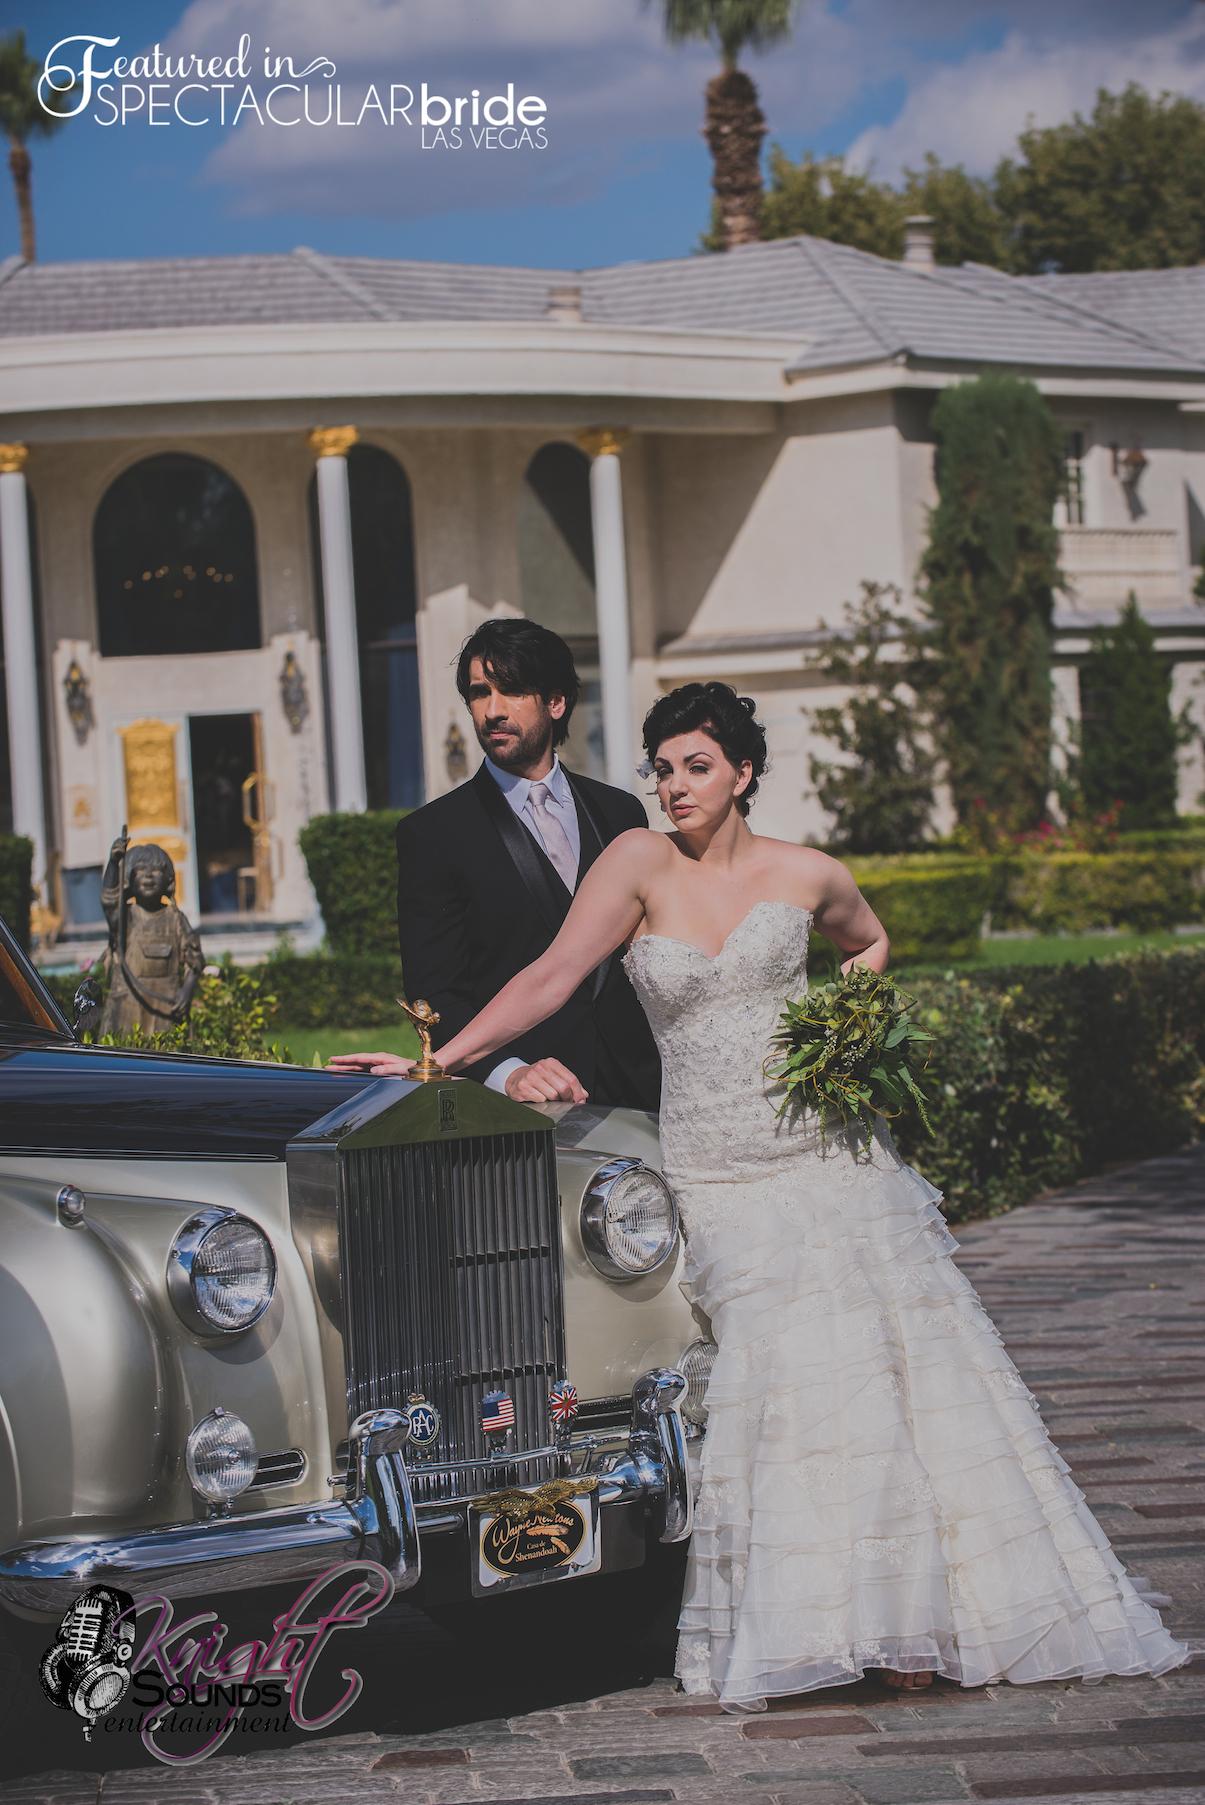 Spectacular Bride Magazine_KSElow-32